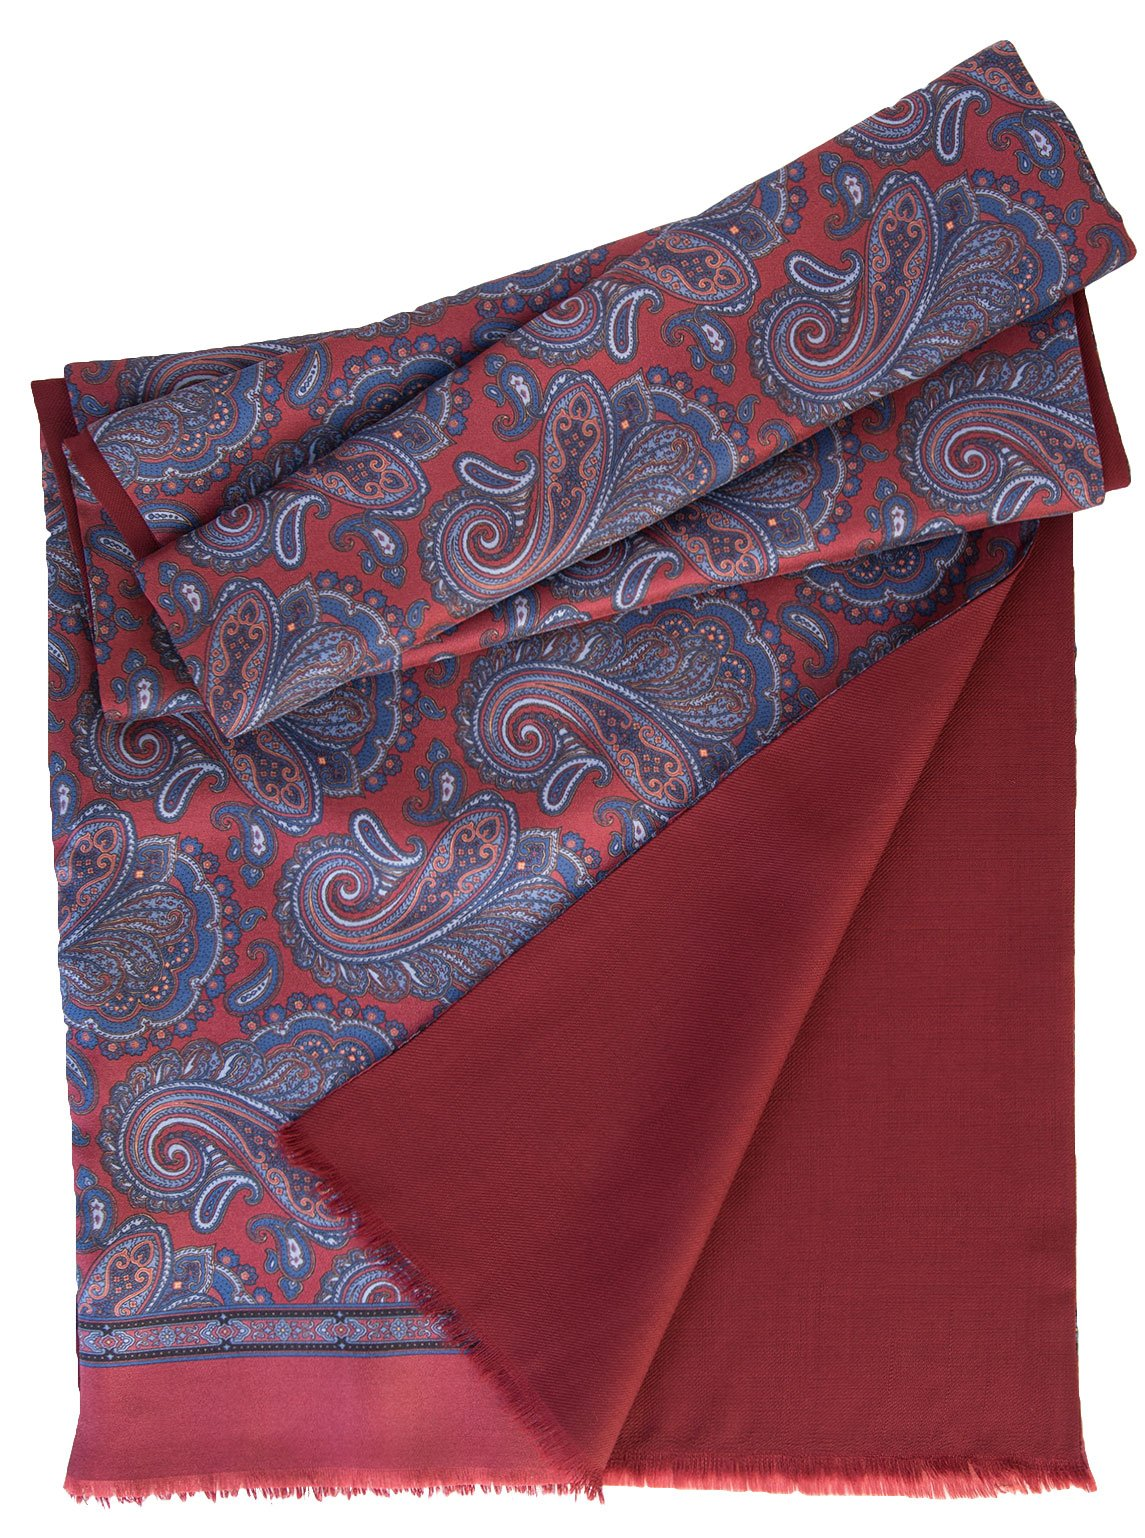 Elizabetta Men's Italian Silk Scarf-Paisley Print-Wool Lined-Burgundy & Blue